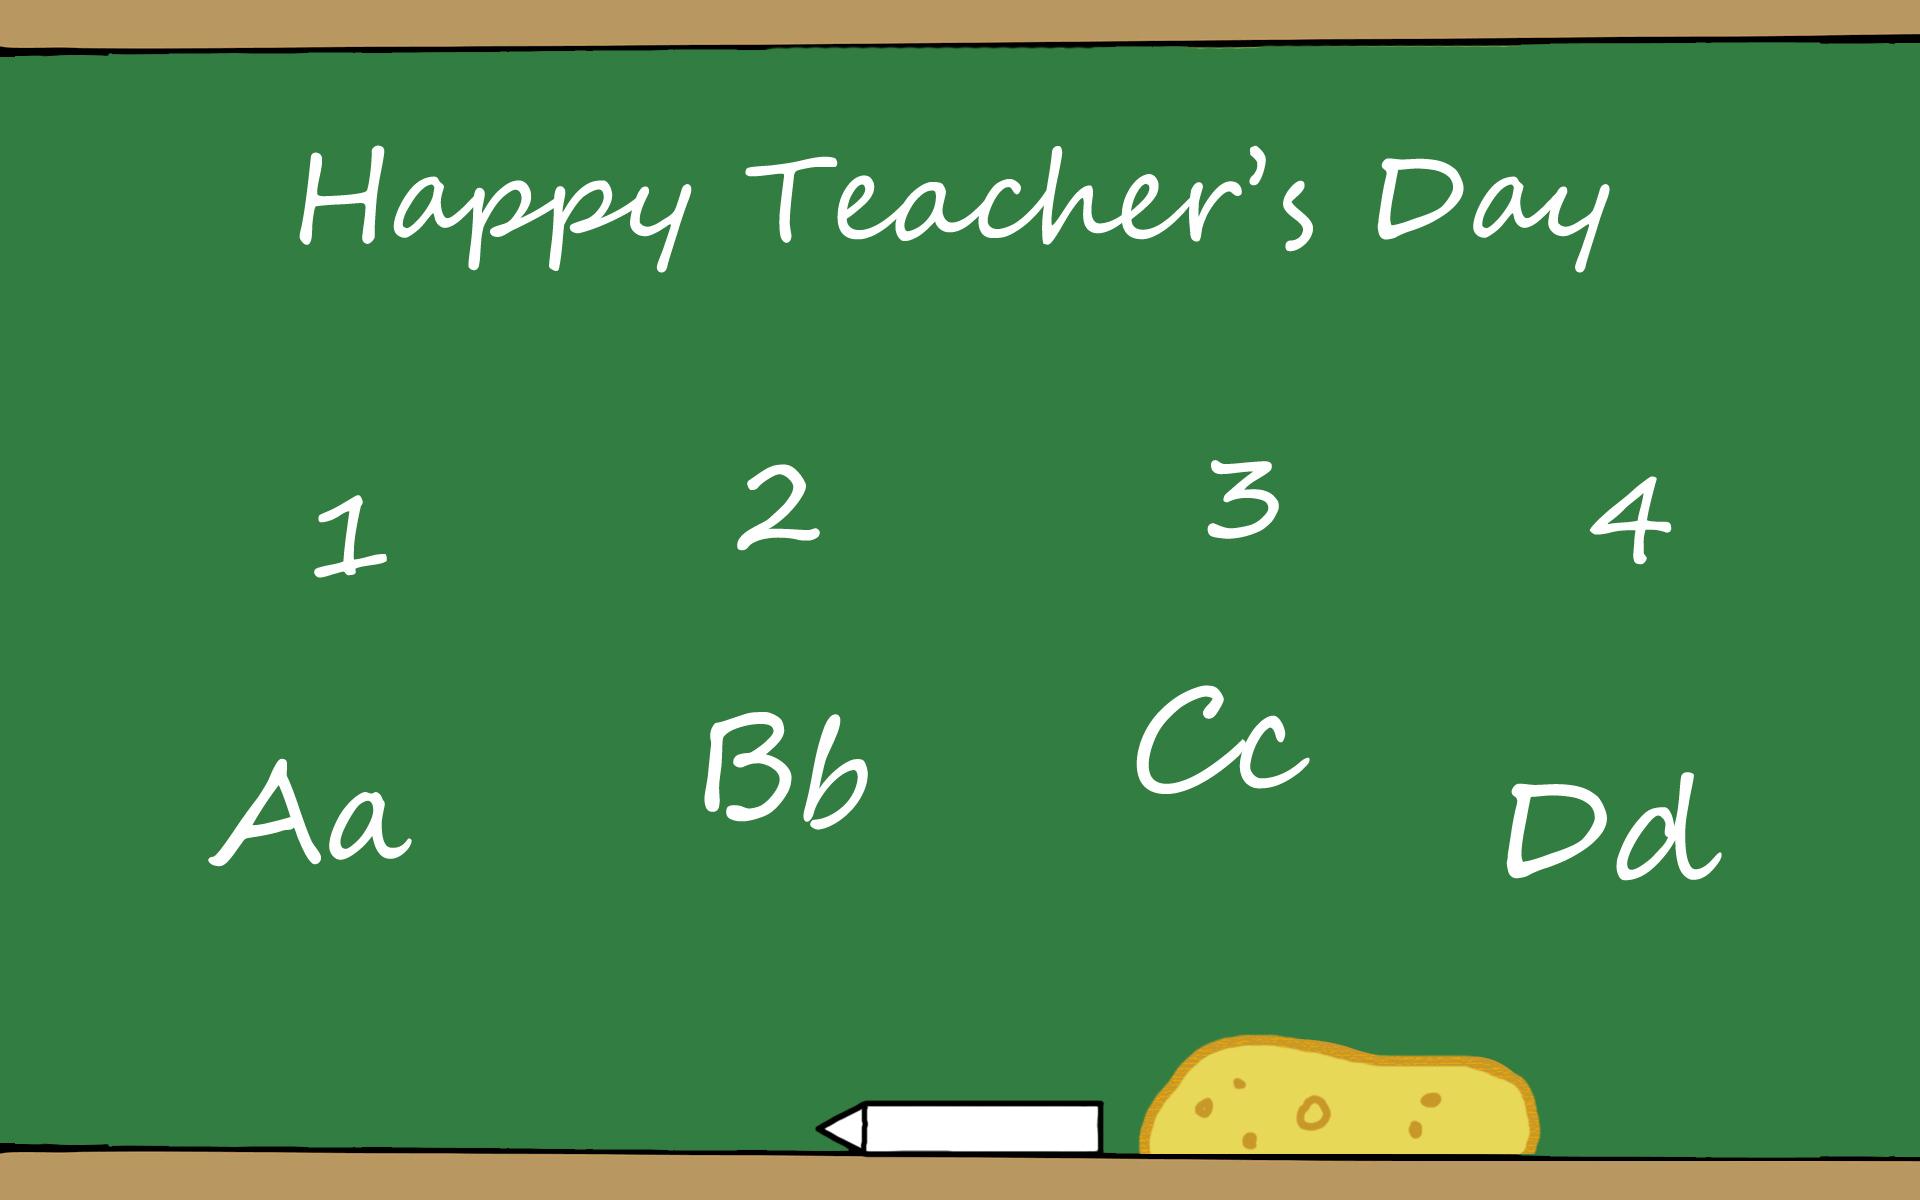 TEACHERS DAY a way to show gratitude to teachers